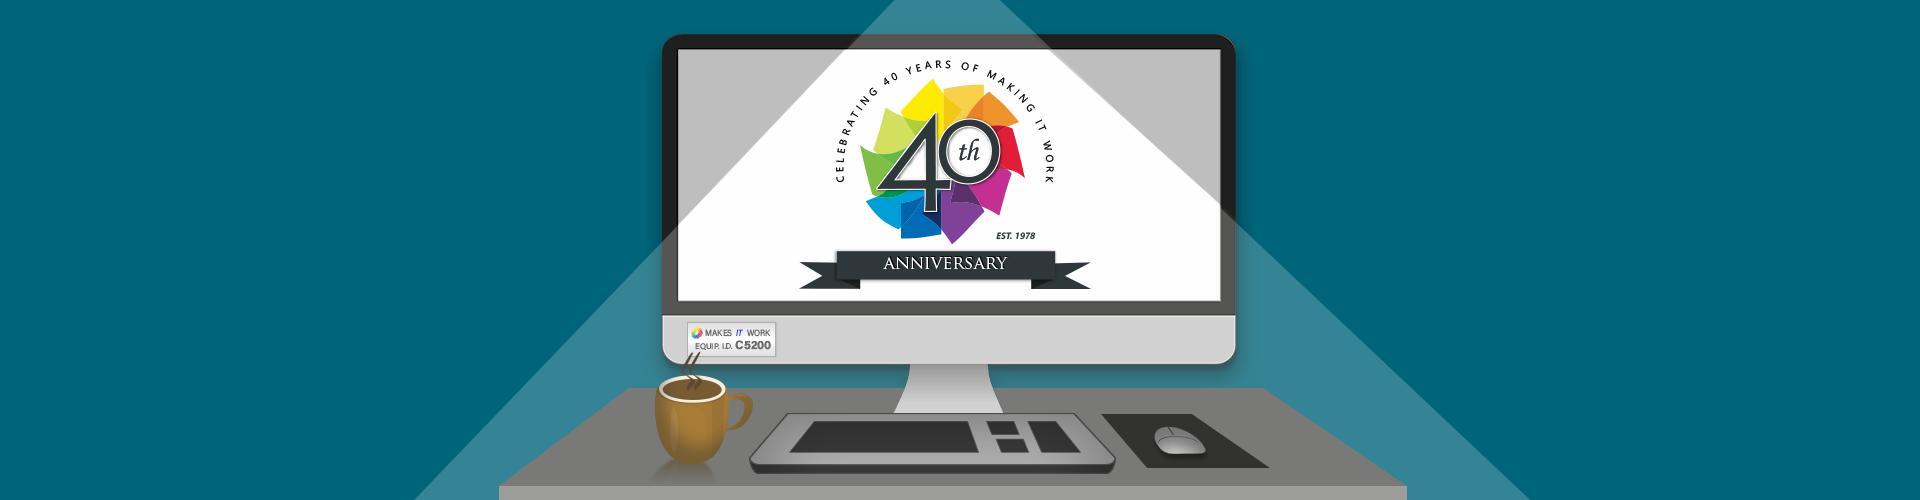 40th Anniversary!